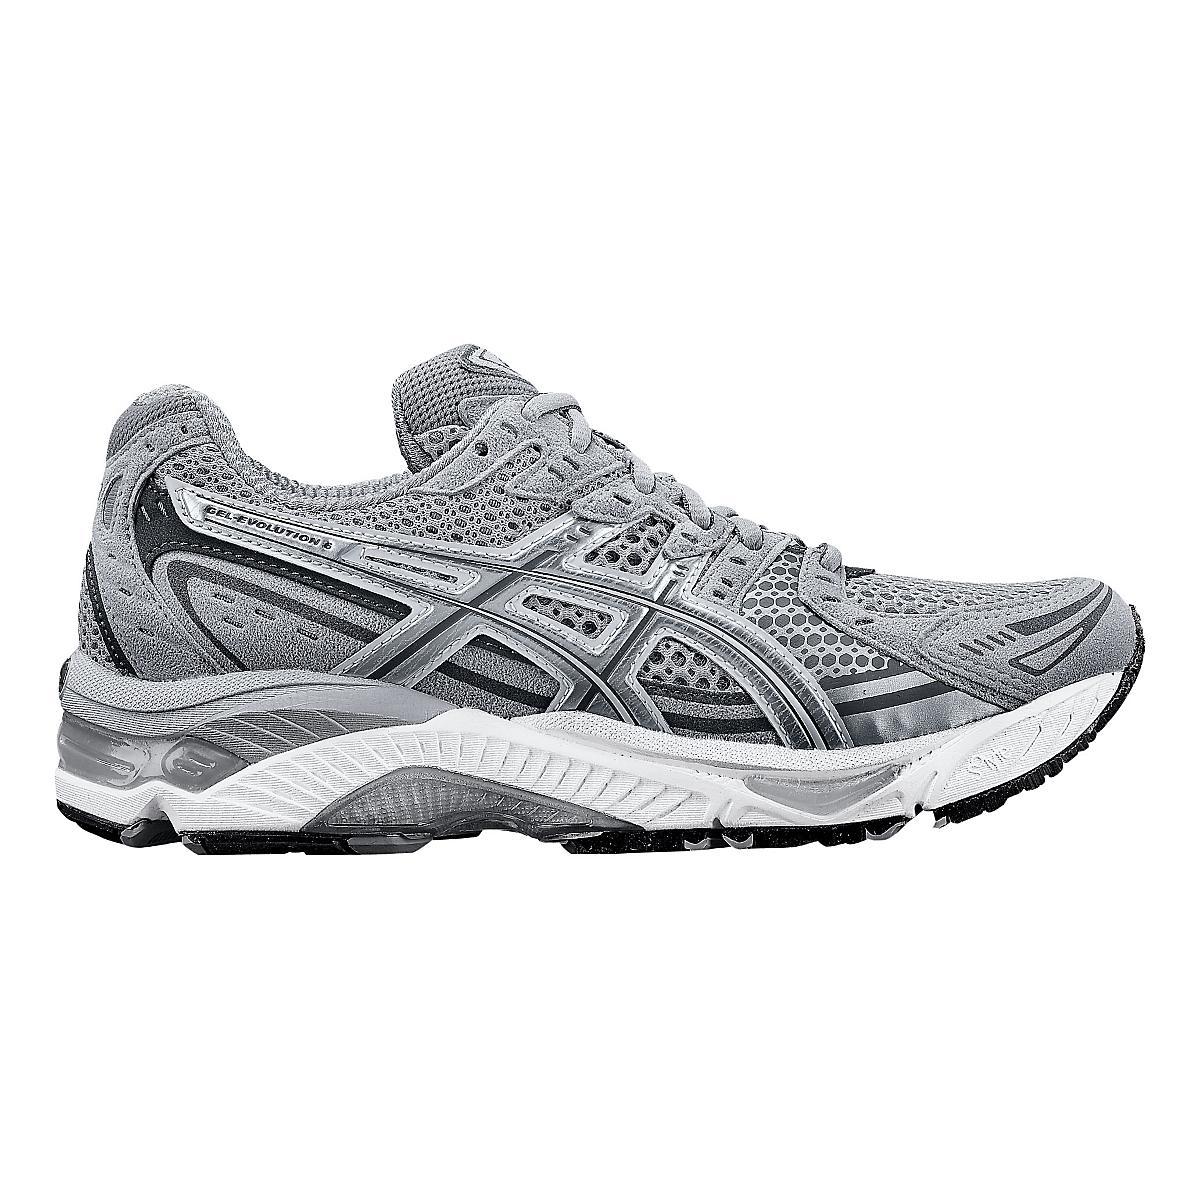 Womens ASICS GEL-Evolution 6 Running Shoe at Road Runner Sports d167c27db0